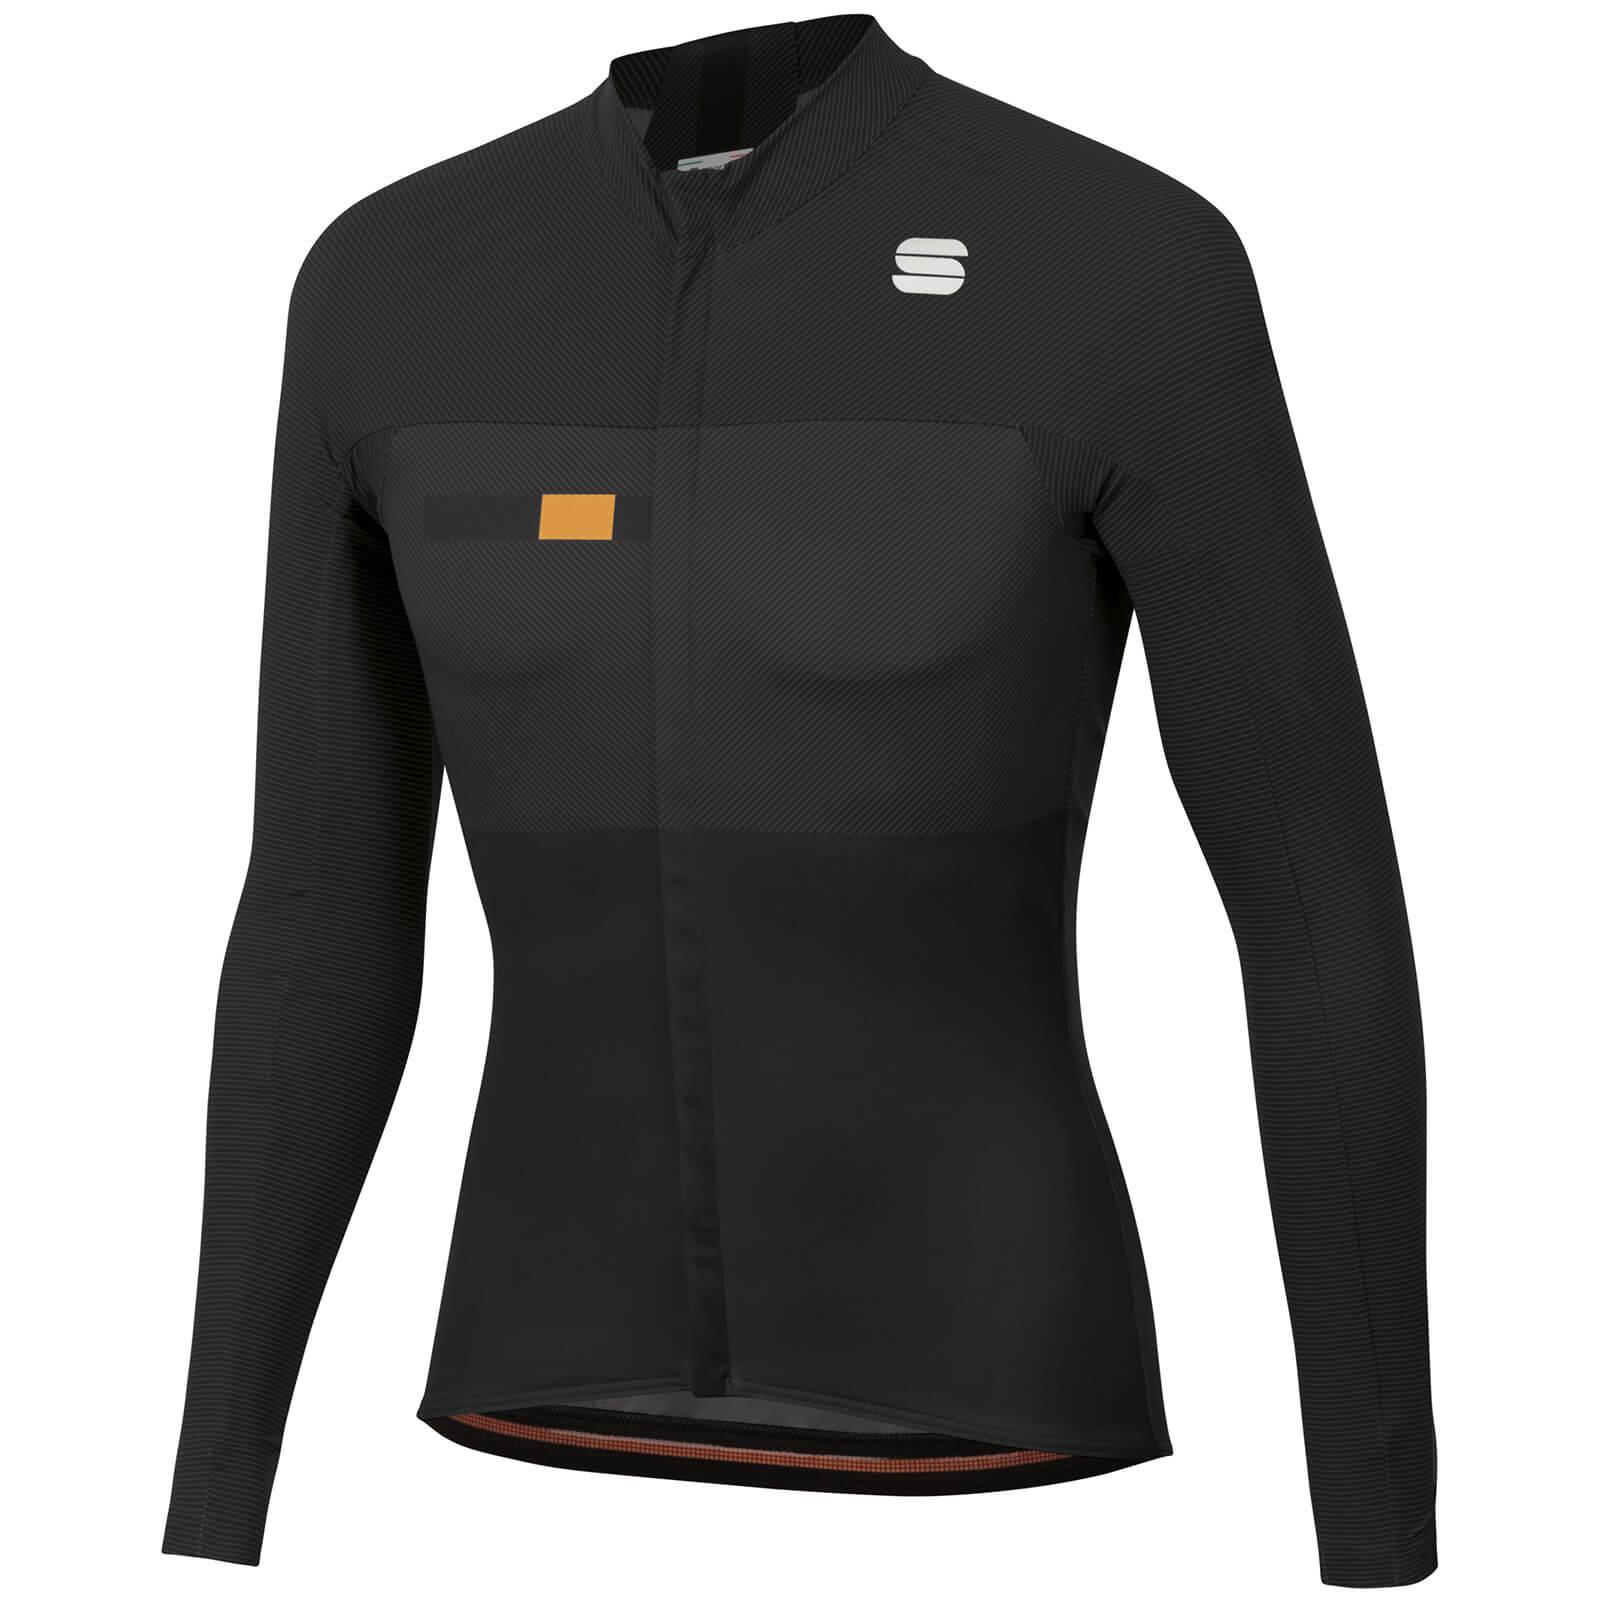 Sportful Bodyfit Pro Thermal Jersey - XL - Black/Gold